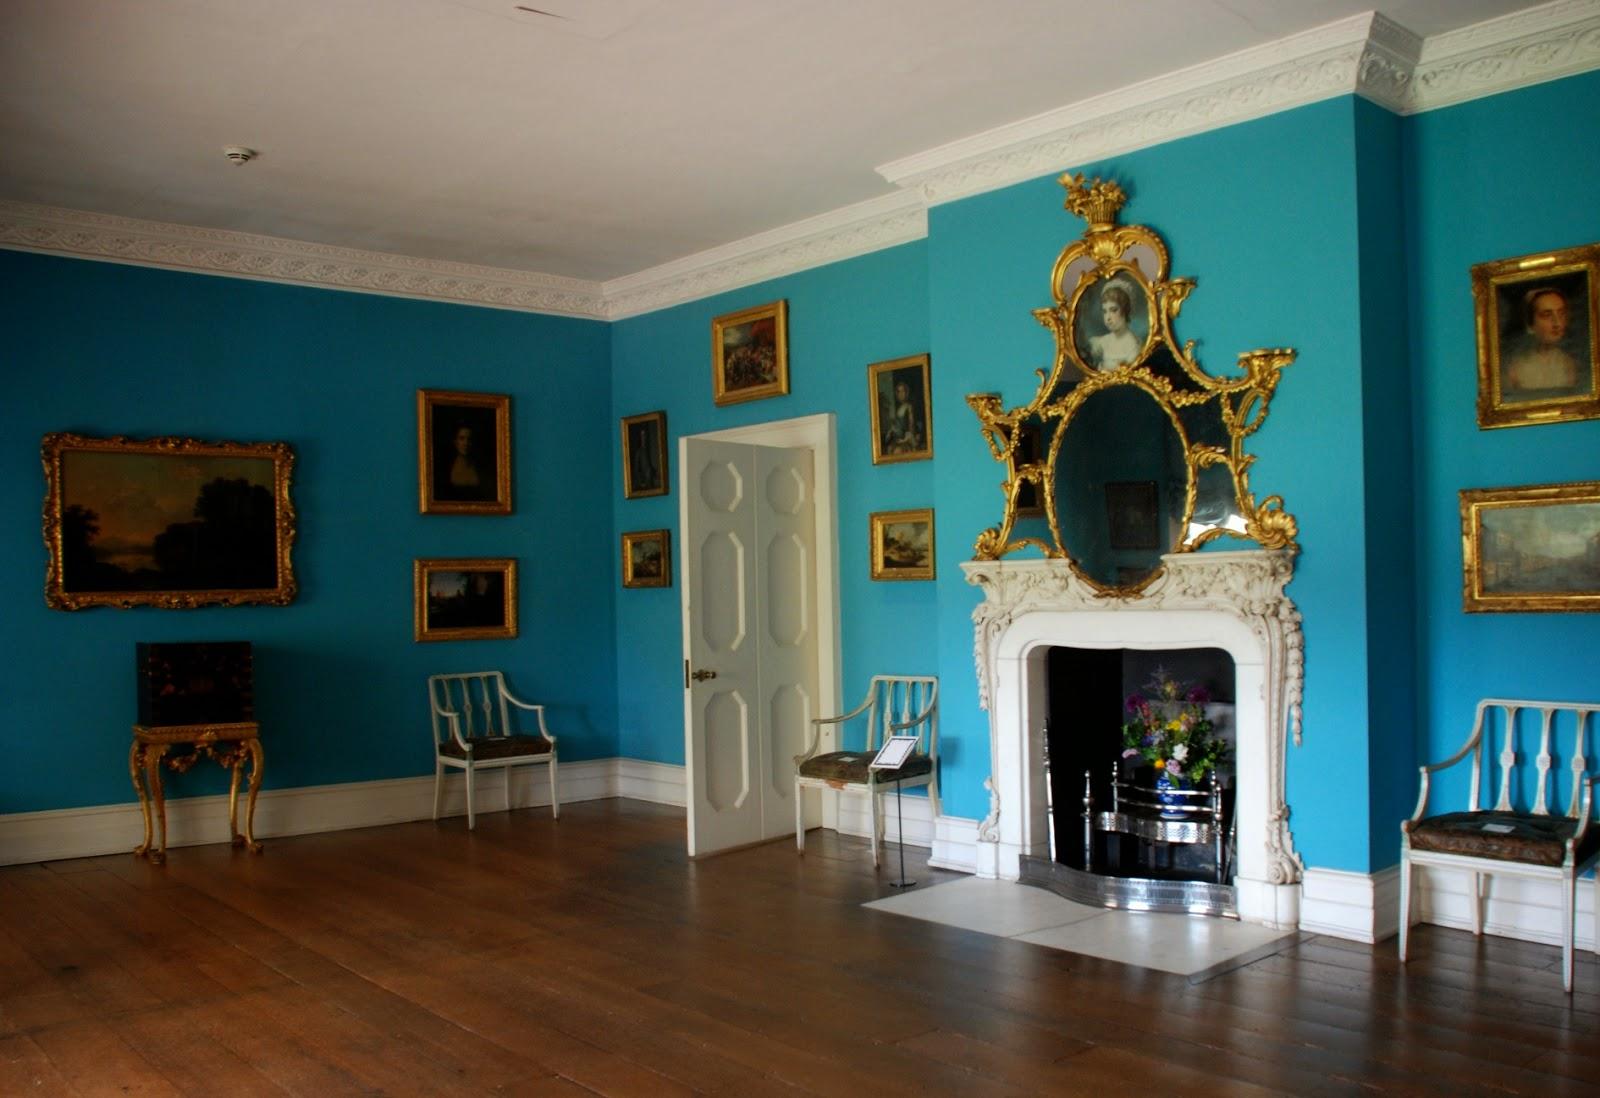 Mrs Child's boudoir, Osterley Park, West London